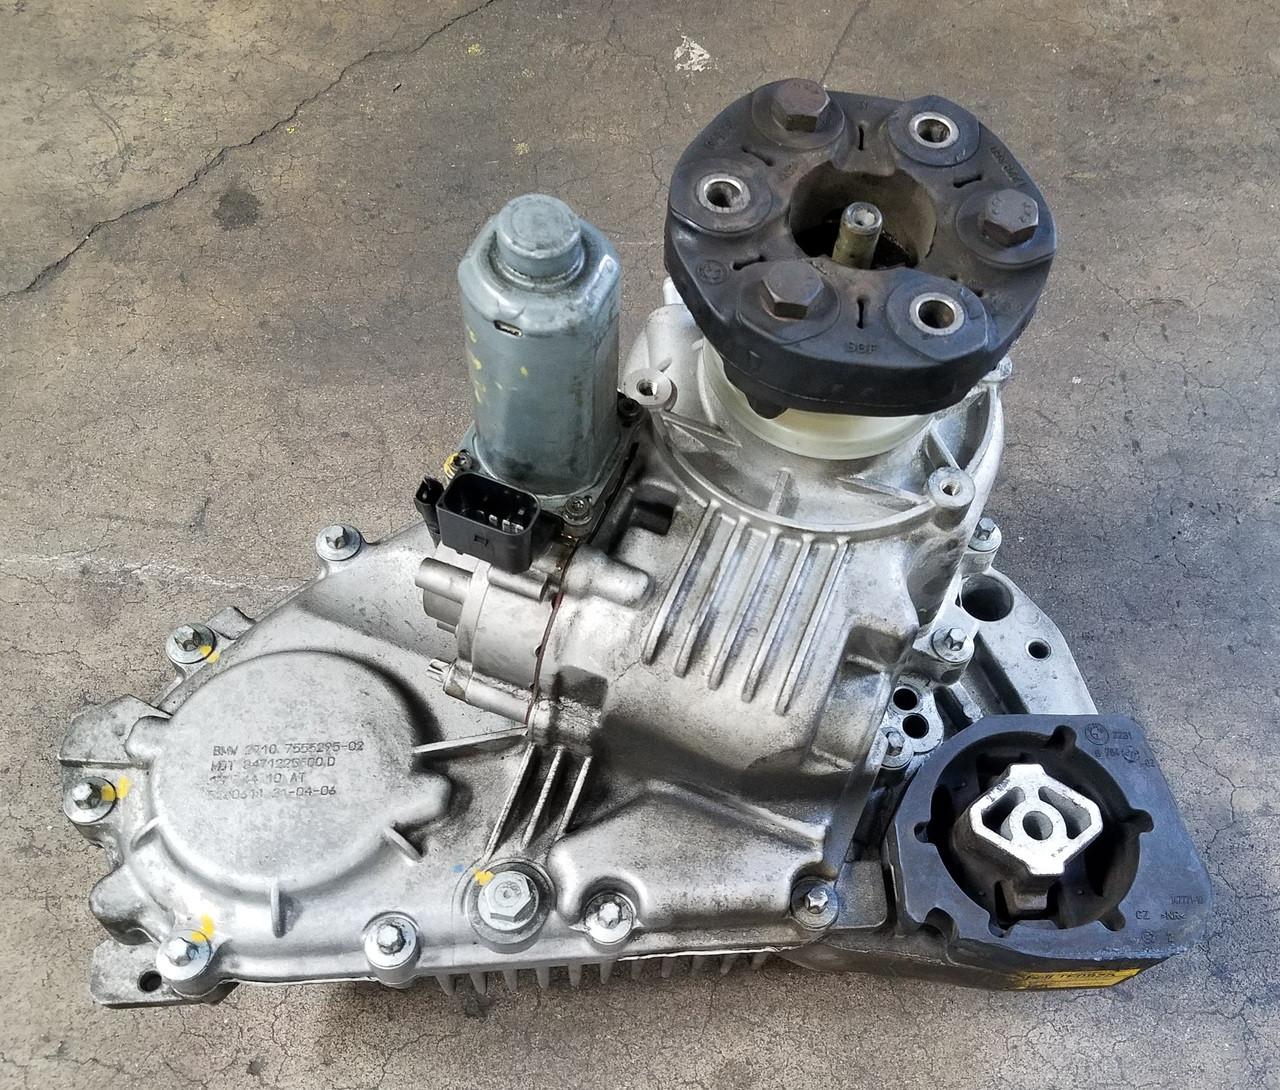 06 BMW E53 X5 4.4 TRANSFER CASE BOX ATC 500 SHIFT ACTUATOR 7555295